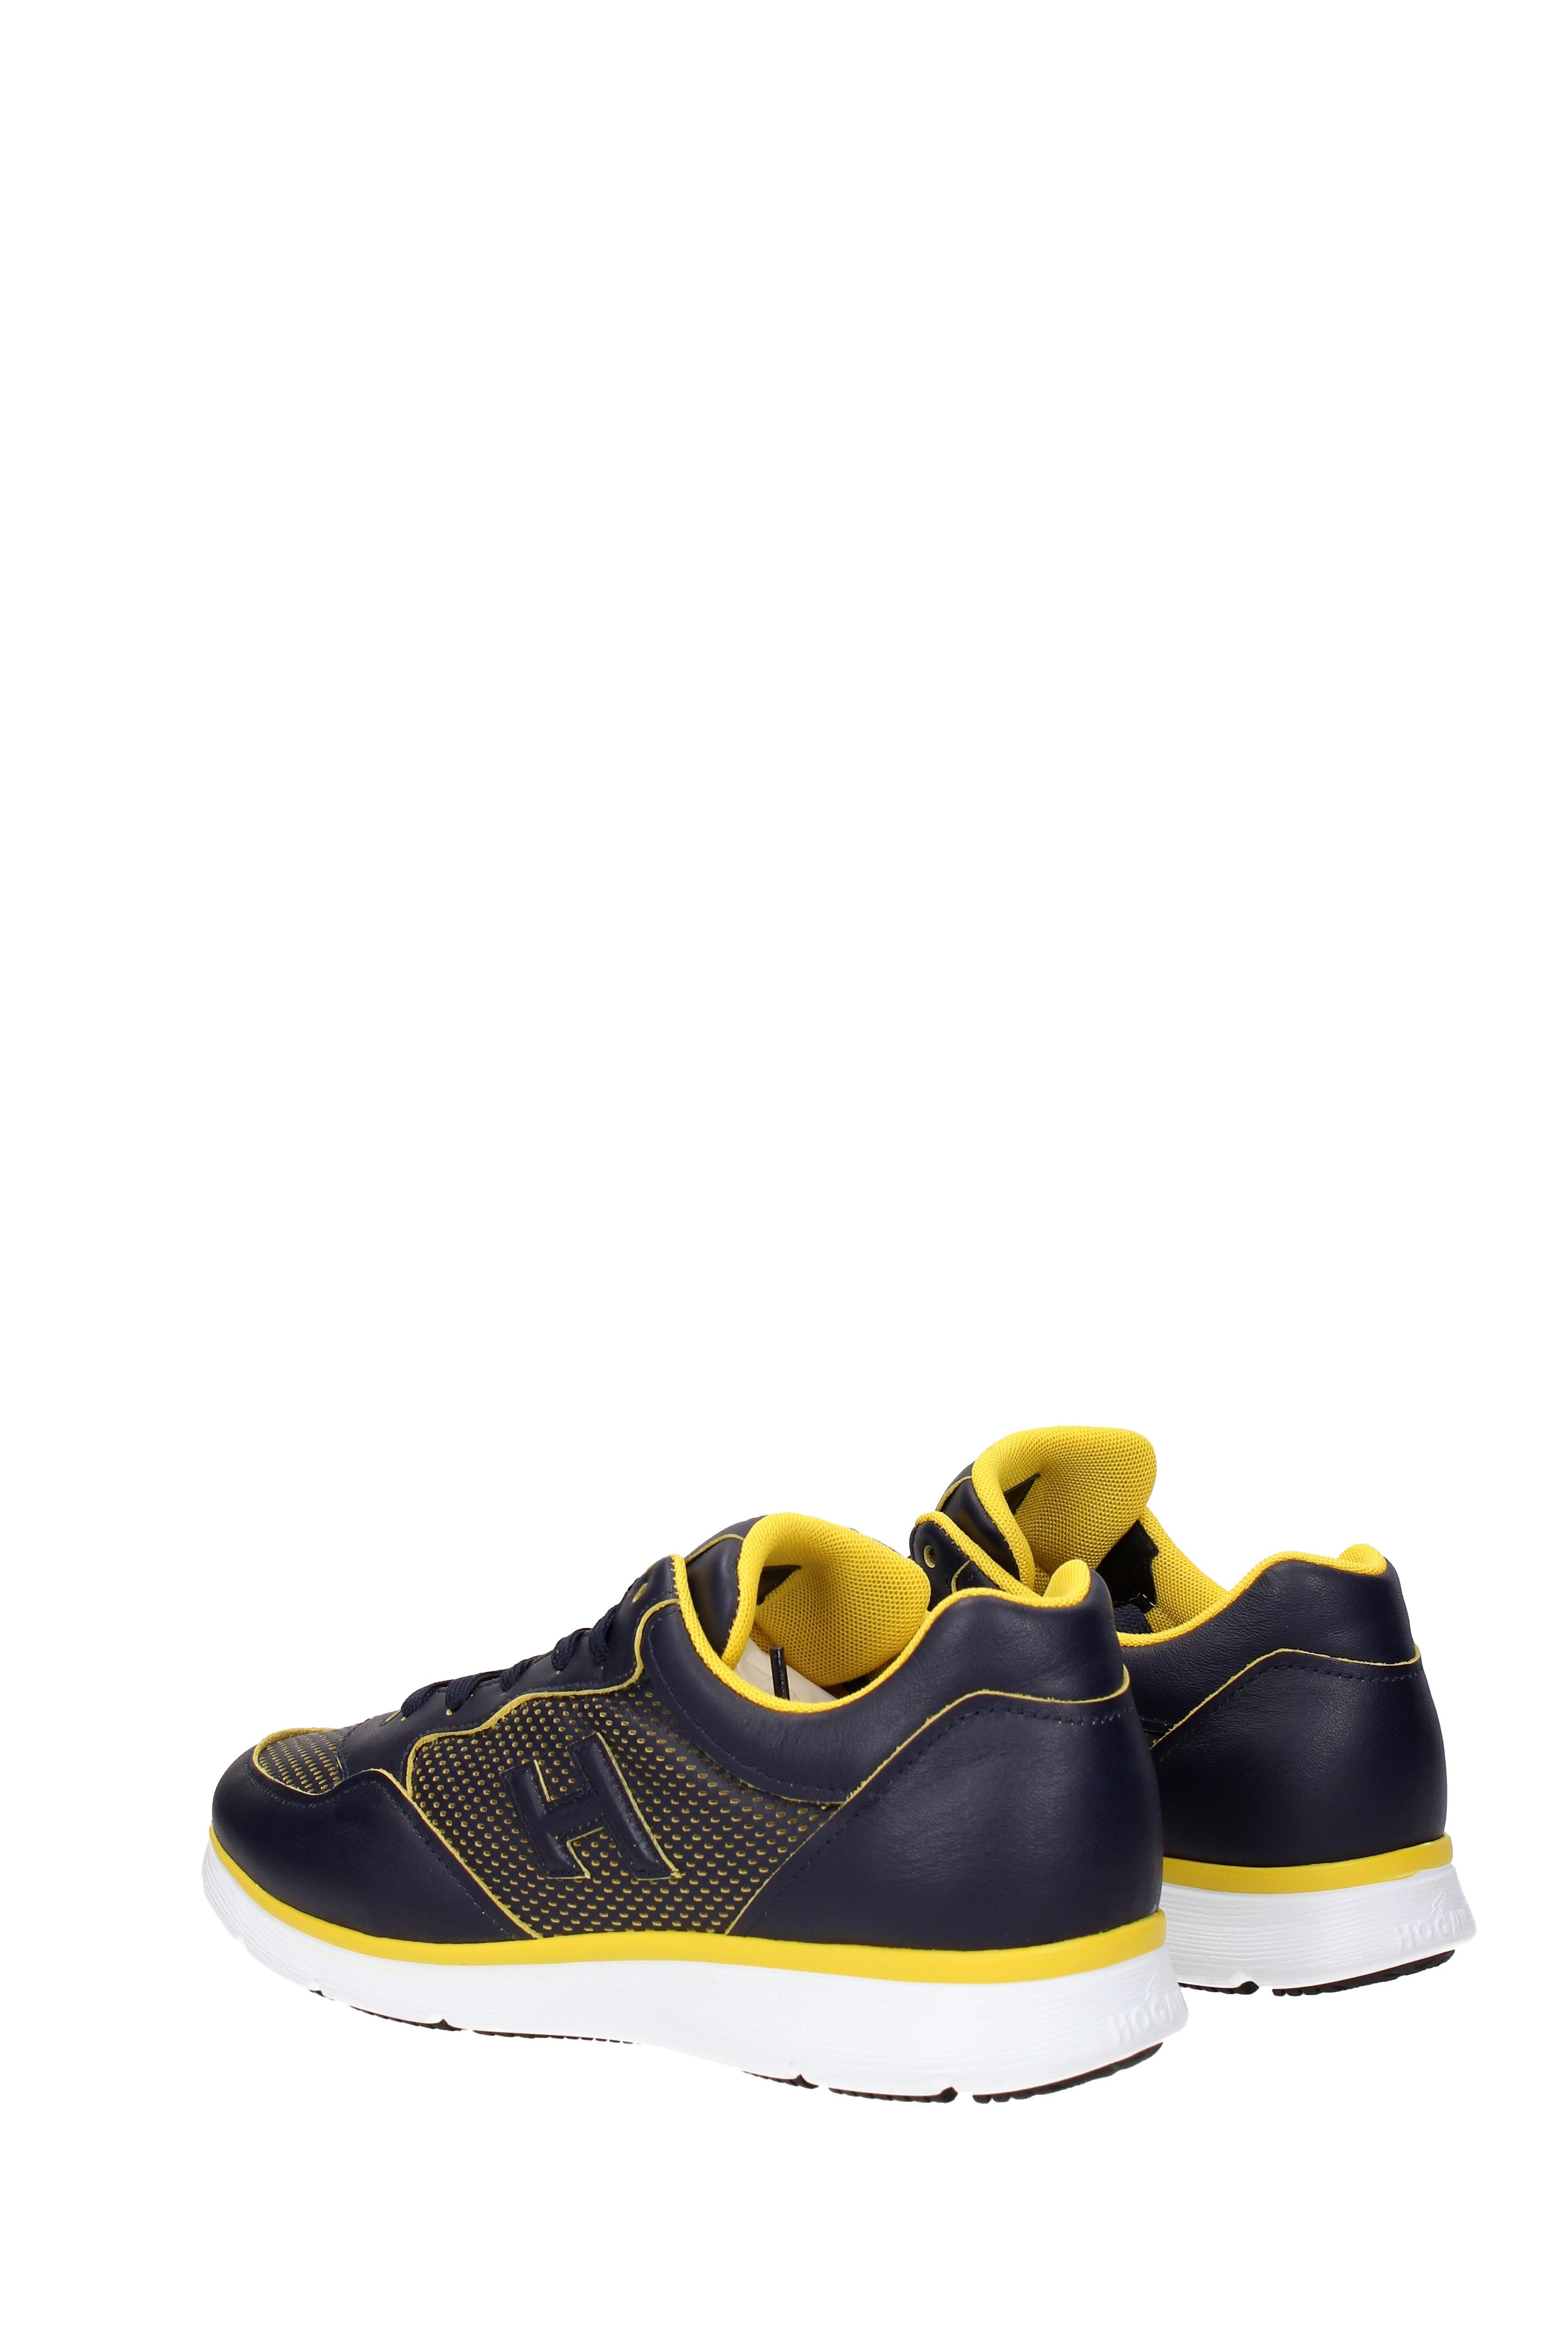 Sneakers-Hogan-Herren-Leder-HXM2540T780FEK